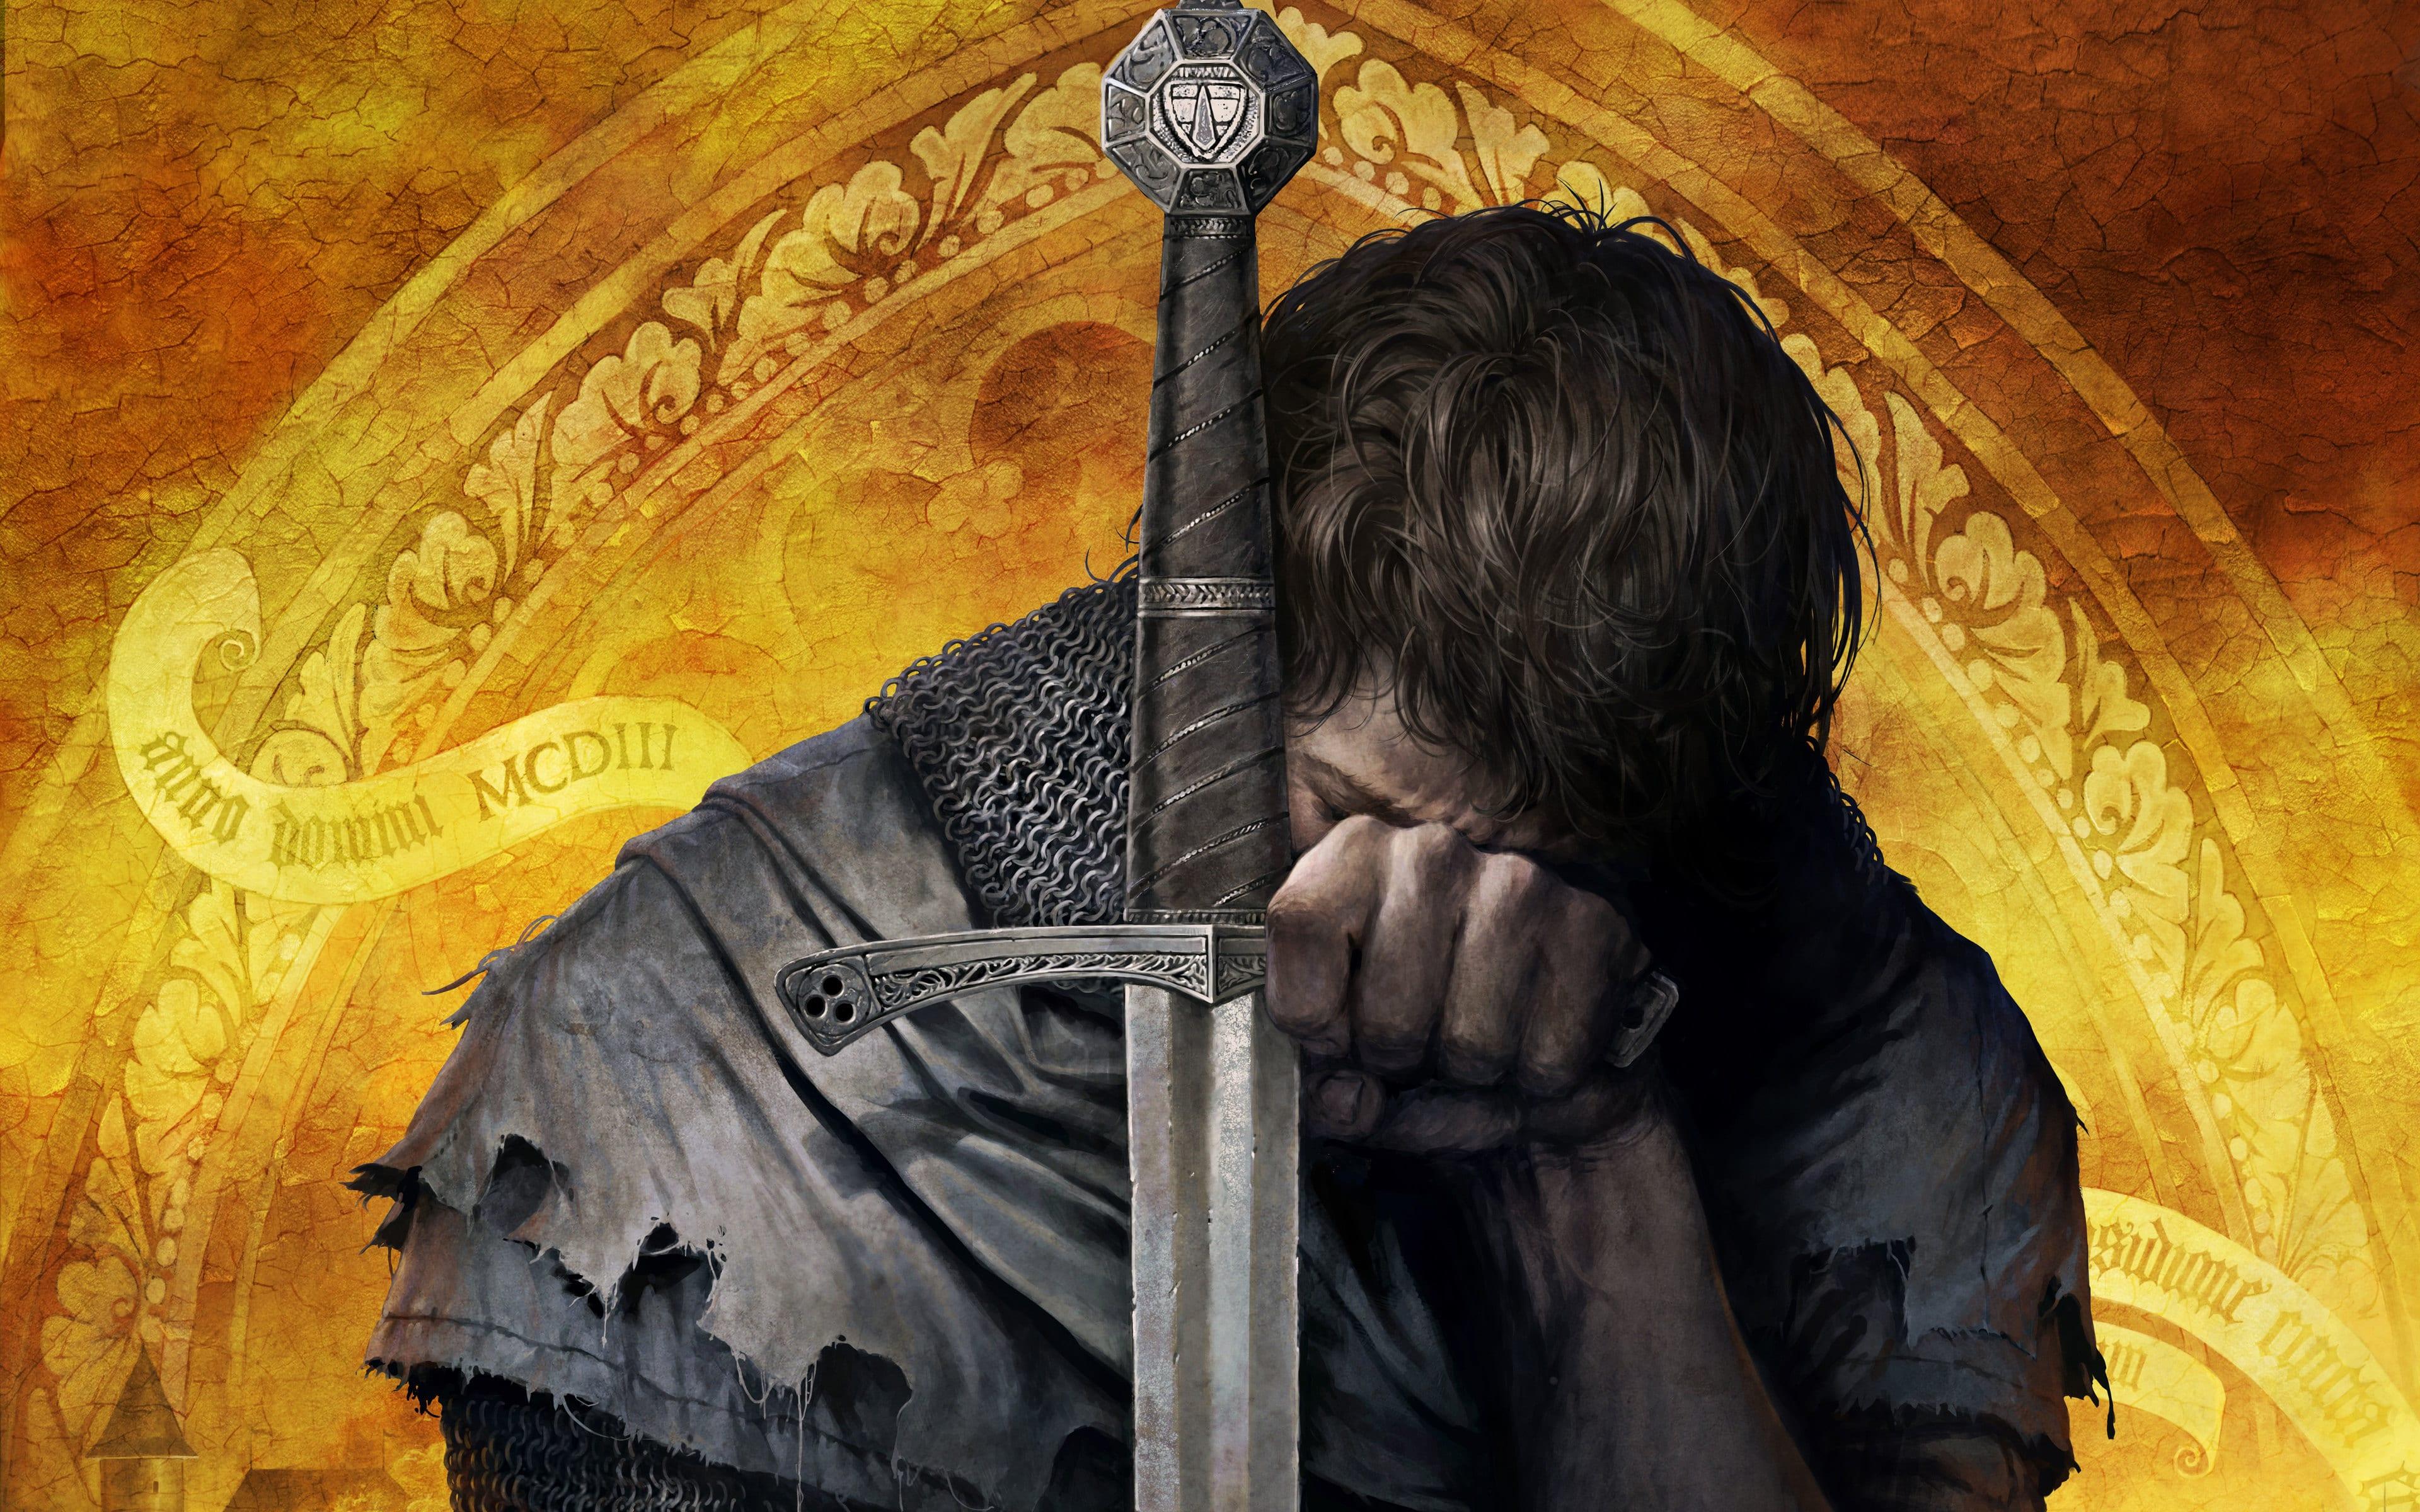 Kingdom Come: Deliverance Wallpapers - Wallpaper Cave